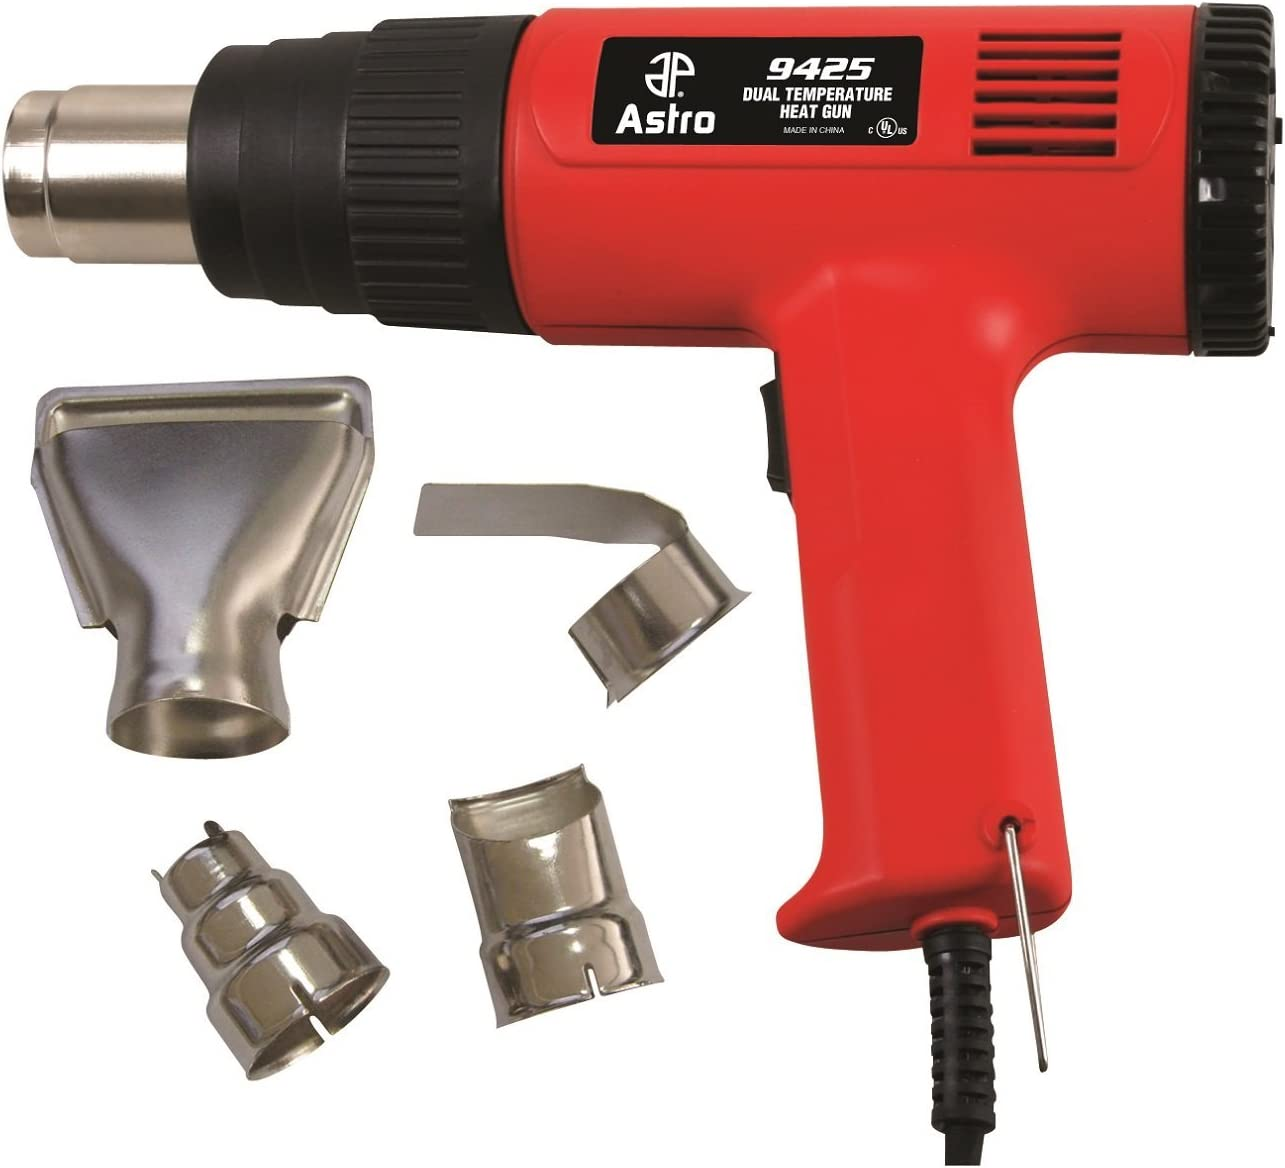 Astro 9425 Dual Temperature Heat Gun Kit 並行輸入品